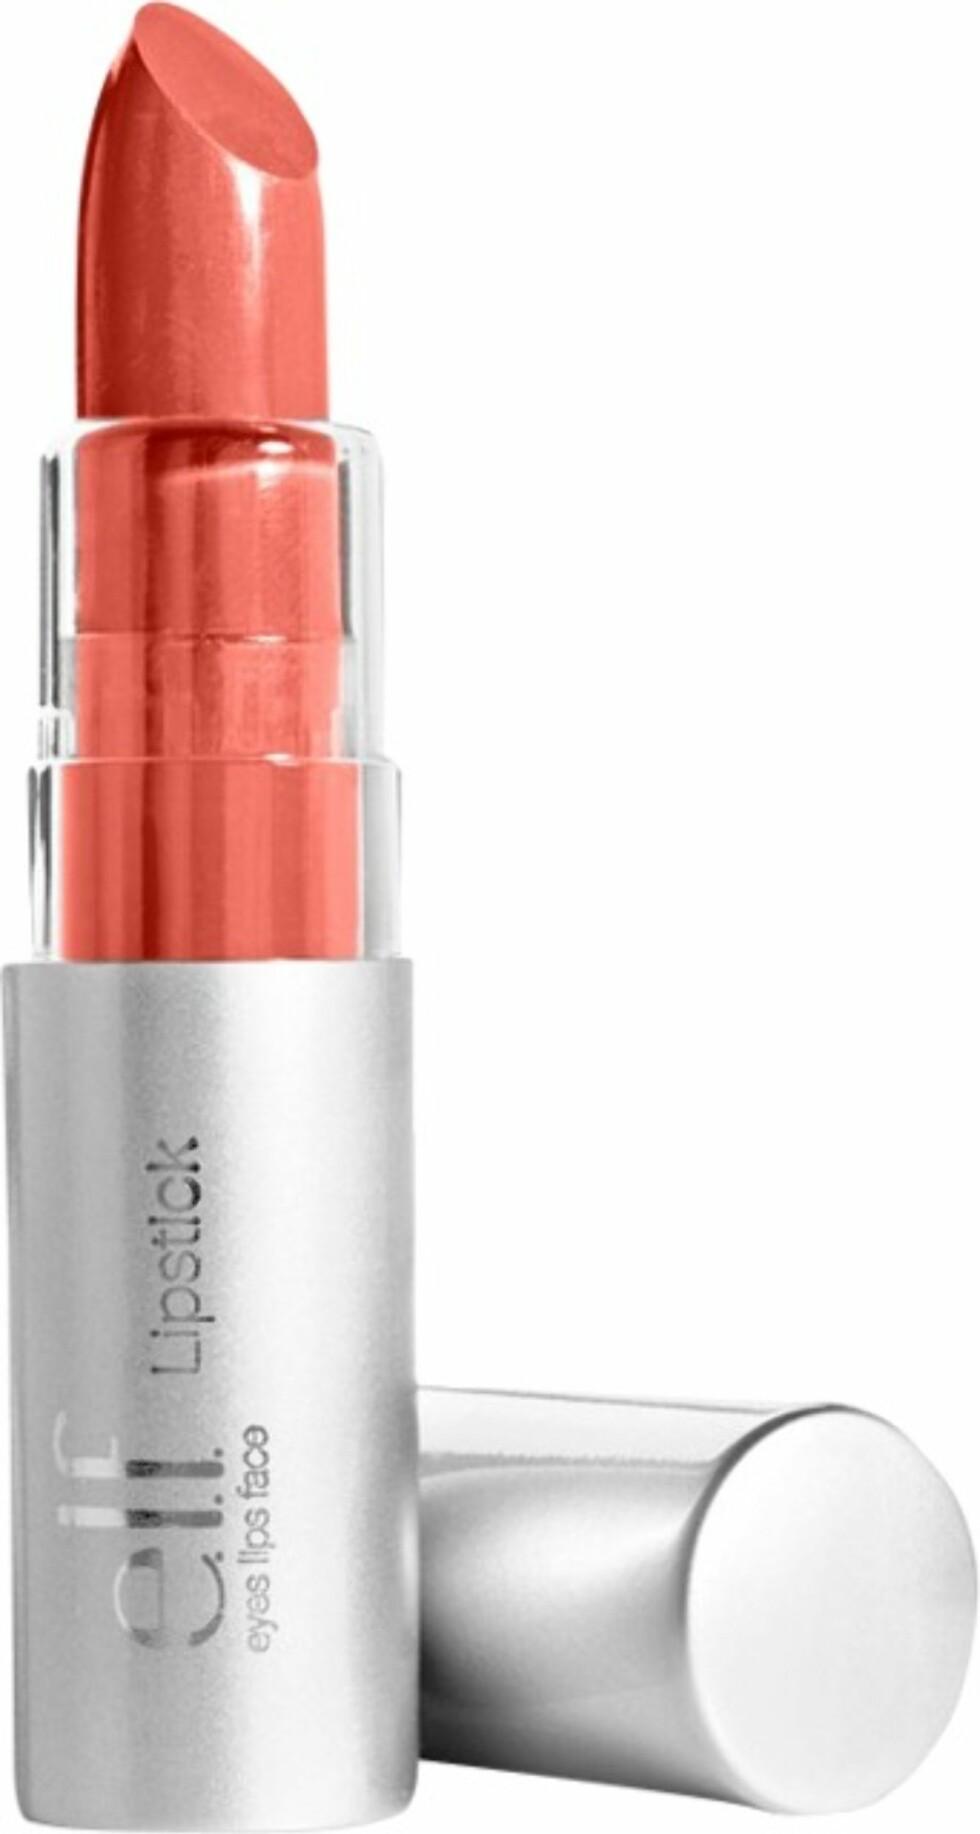 Essential Lipstick i fargen Captivating fra Elf, kr 14.  Foto: Produsenten